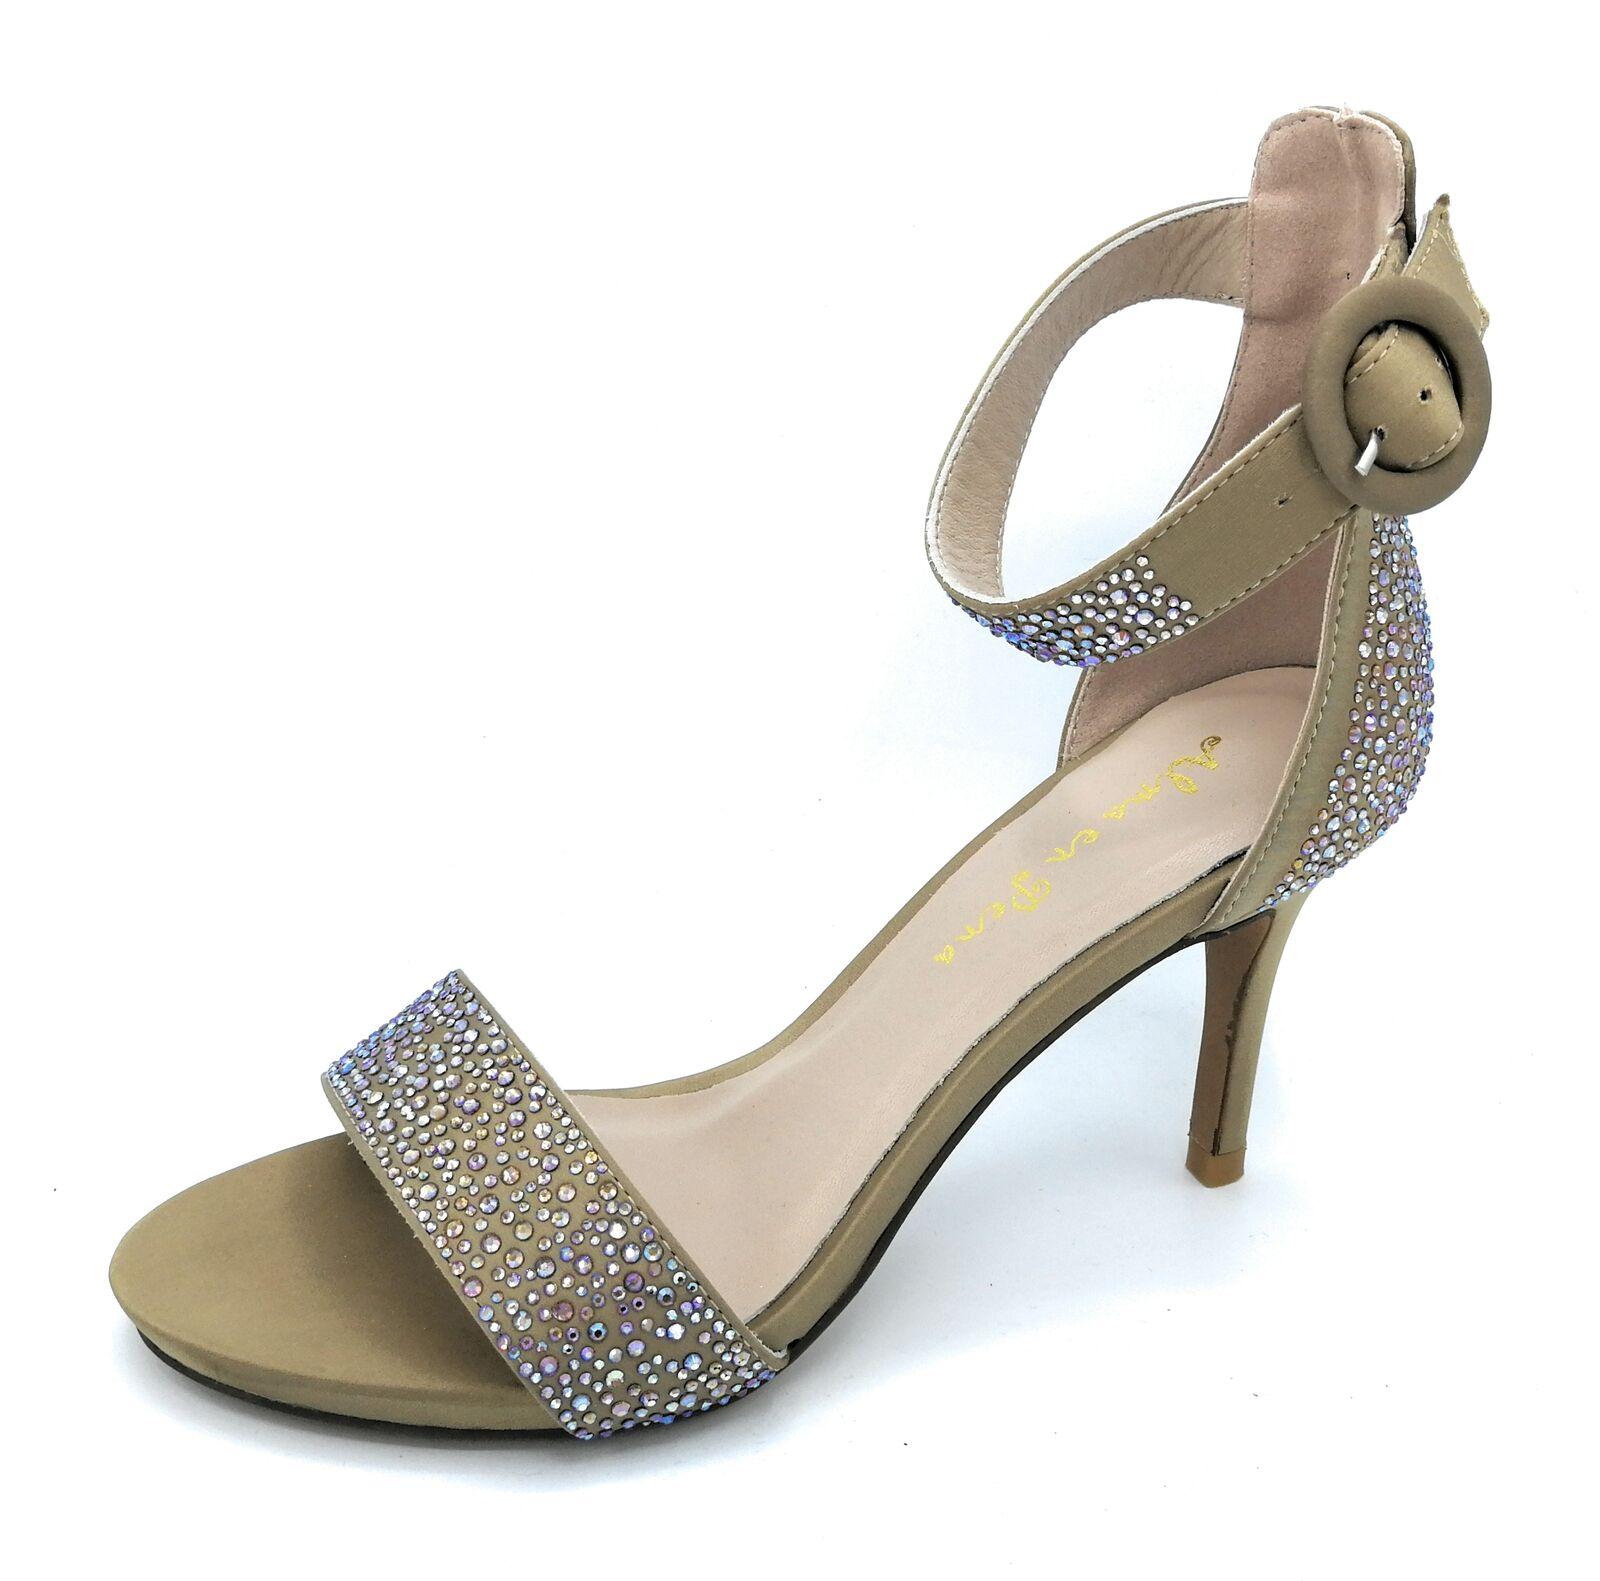 Alma en Pena V18242 Sandale Avec Bride Double Cheville Satin Bronze Strass T.7cm